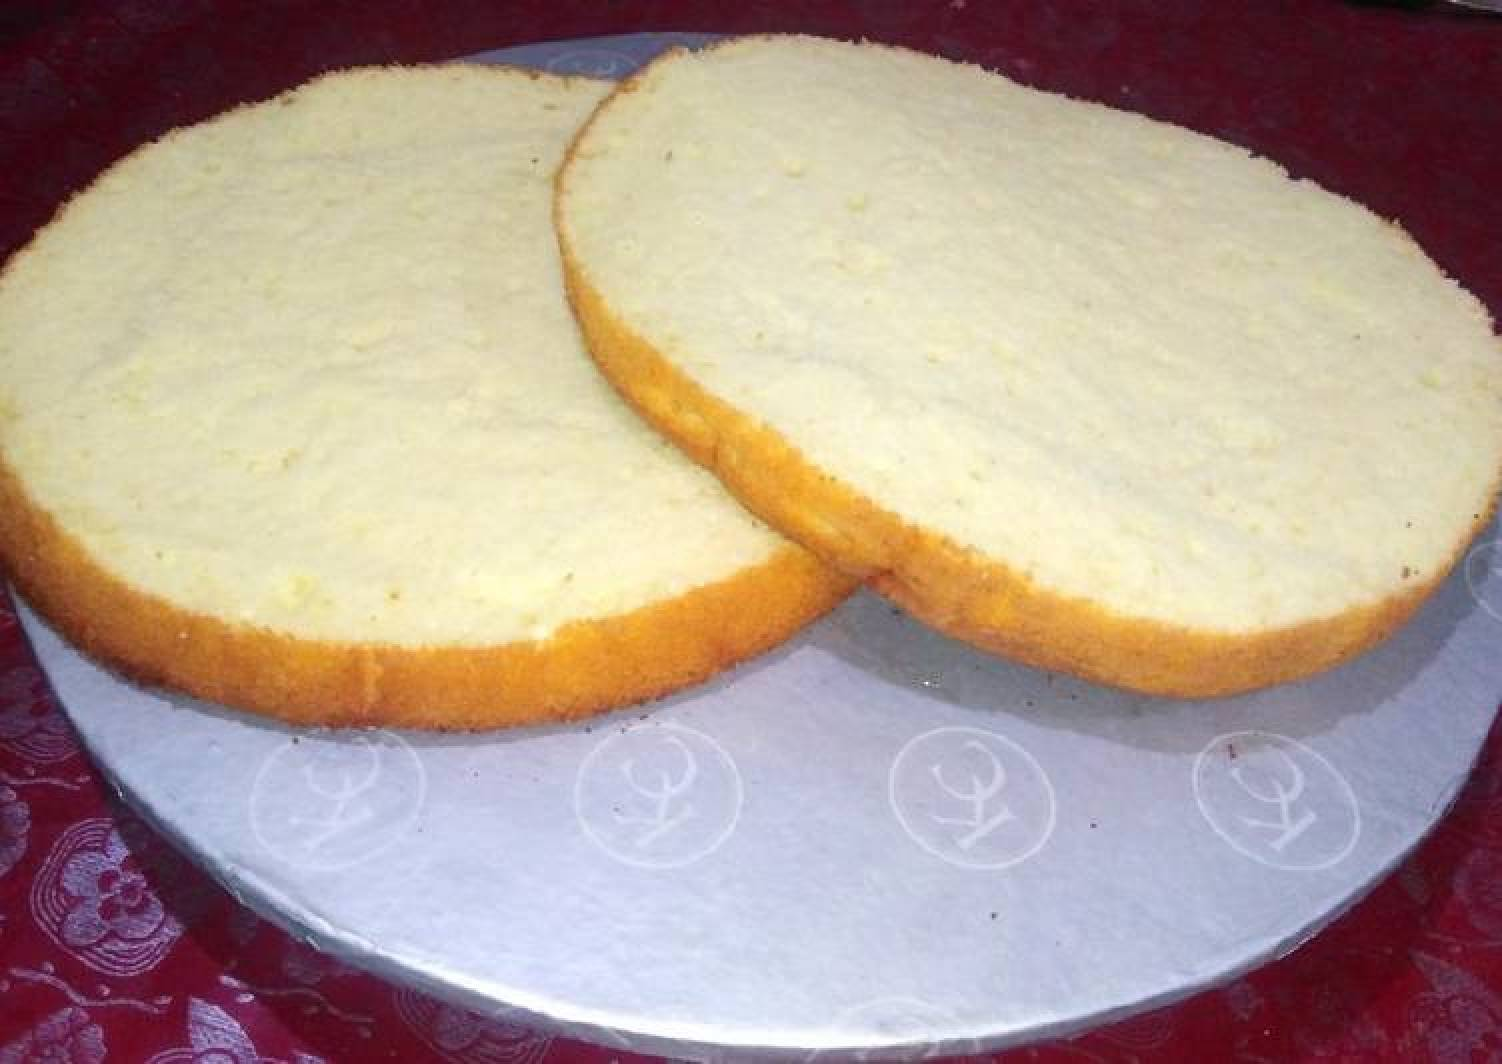 Fluffy vanilla sponge cake